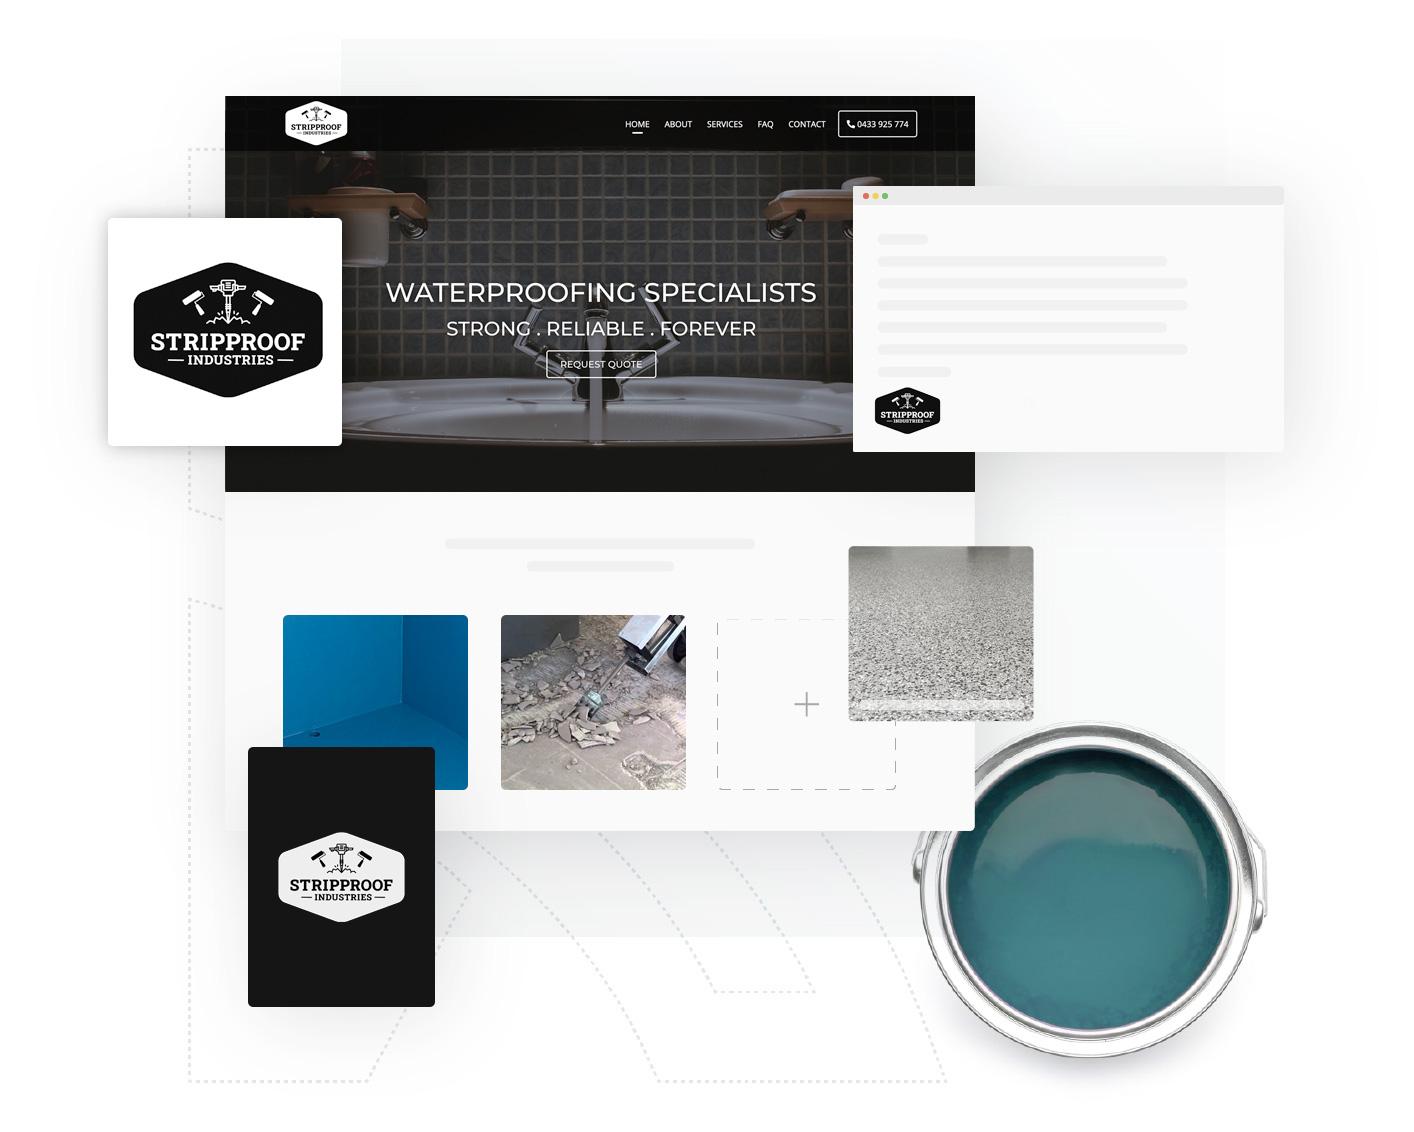 branding-specialist-byron-bay-ballina-lismore-logo-design-robert-mullineux